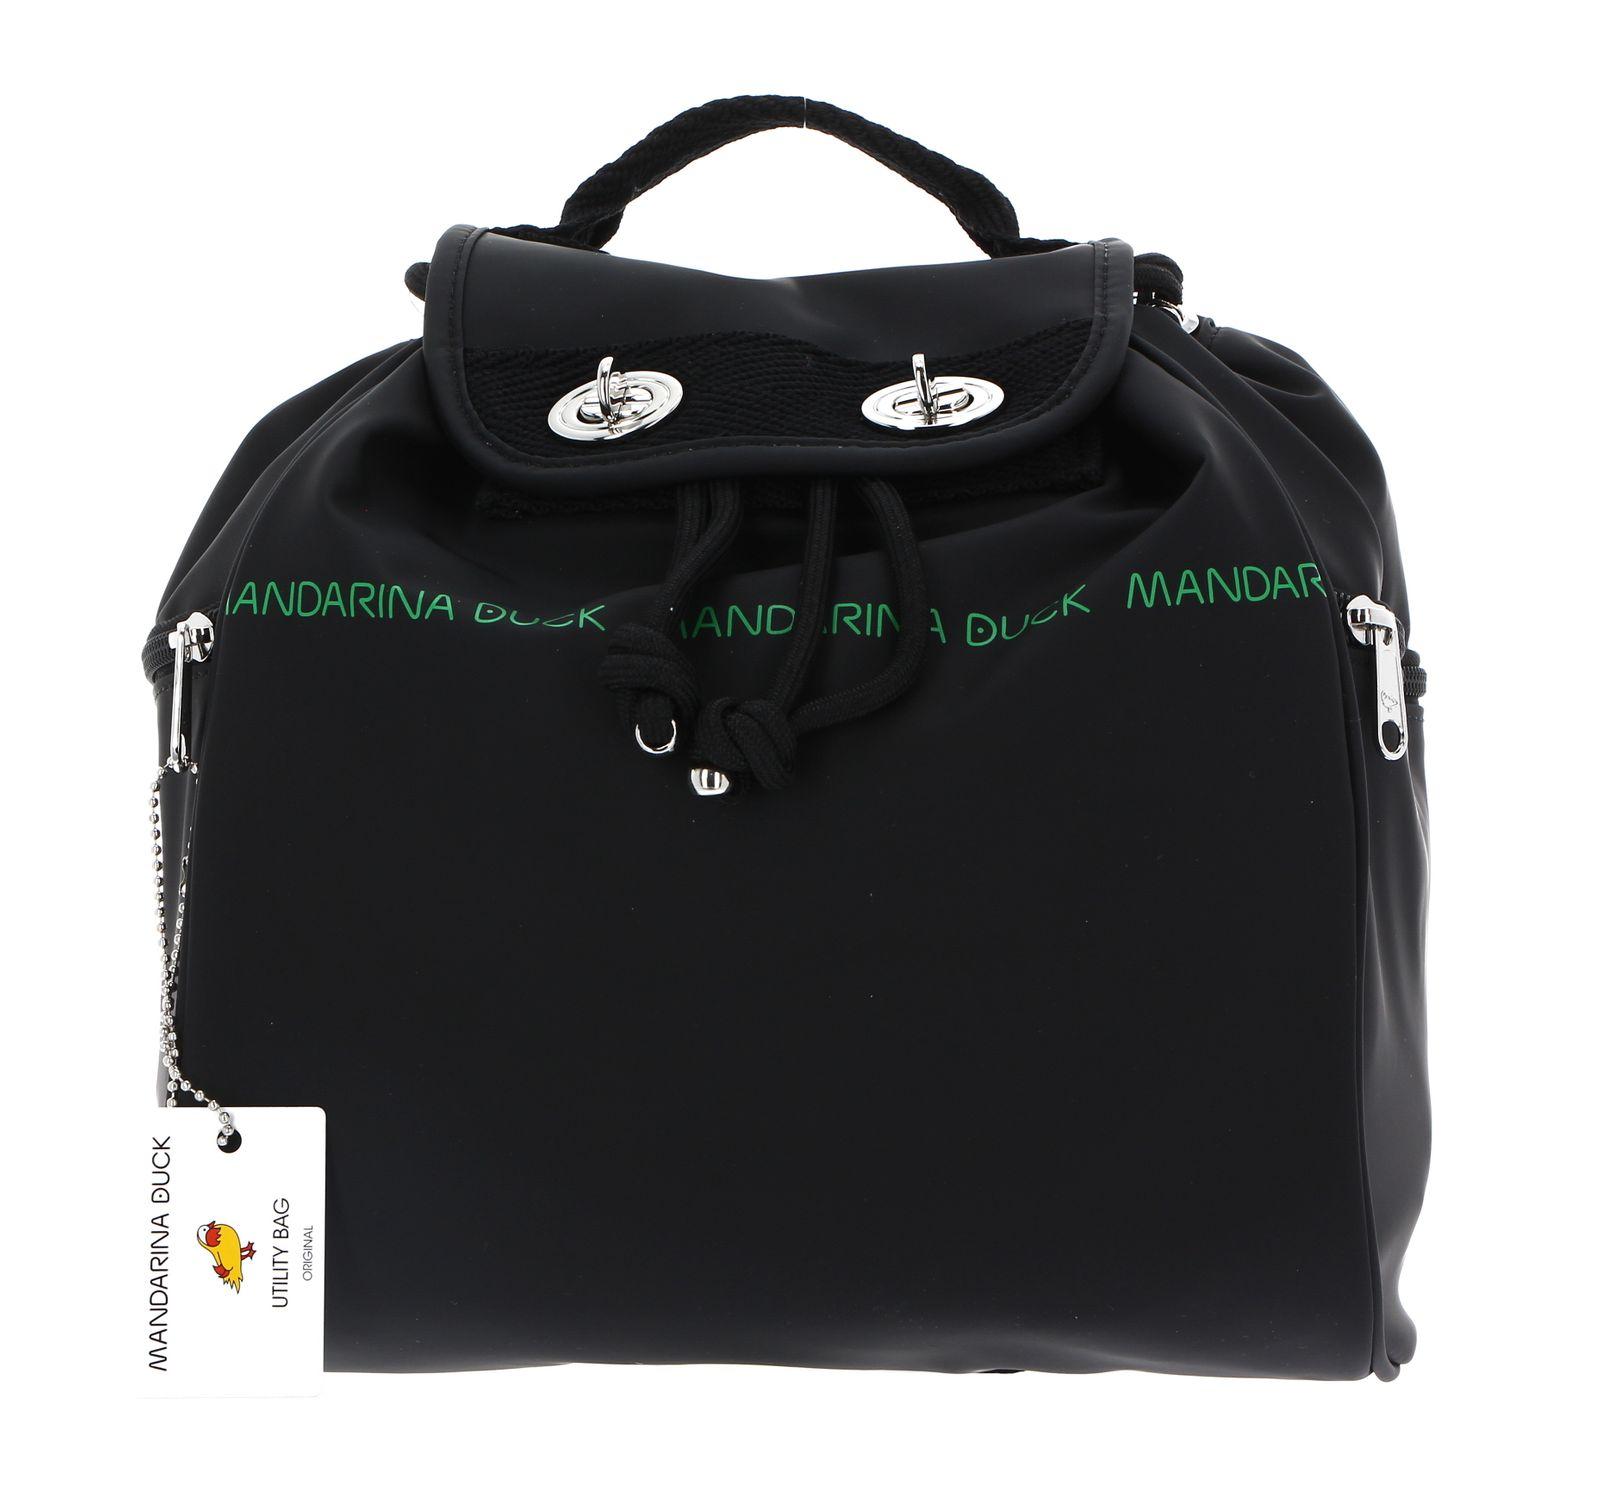 MANDARINA DUCK Utility Backpack Black